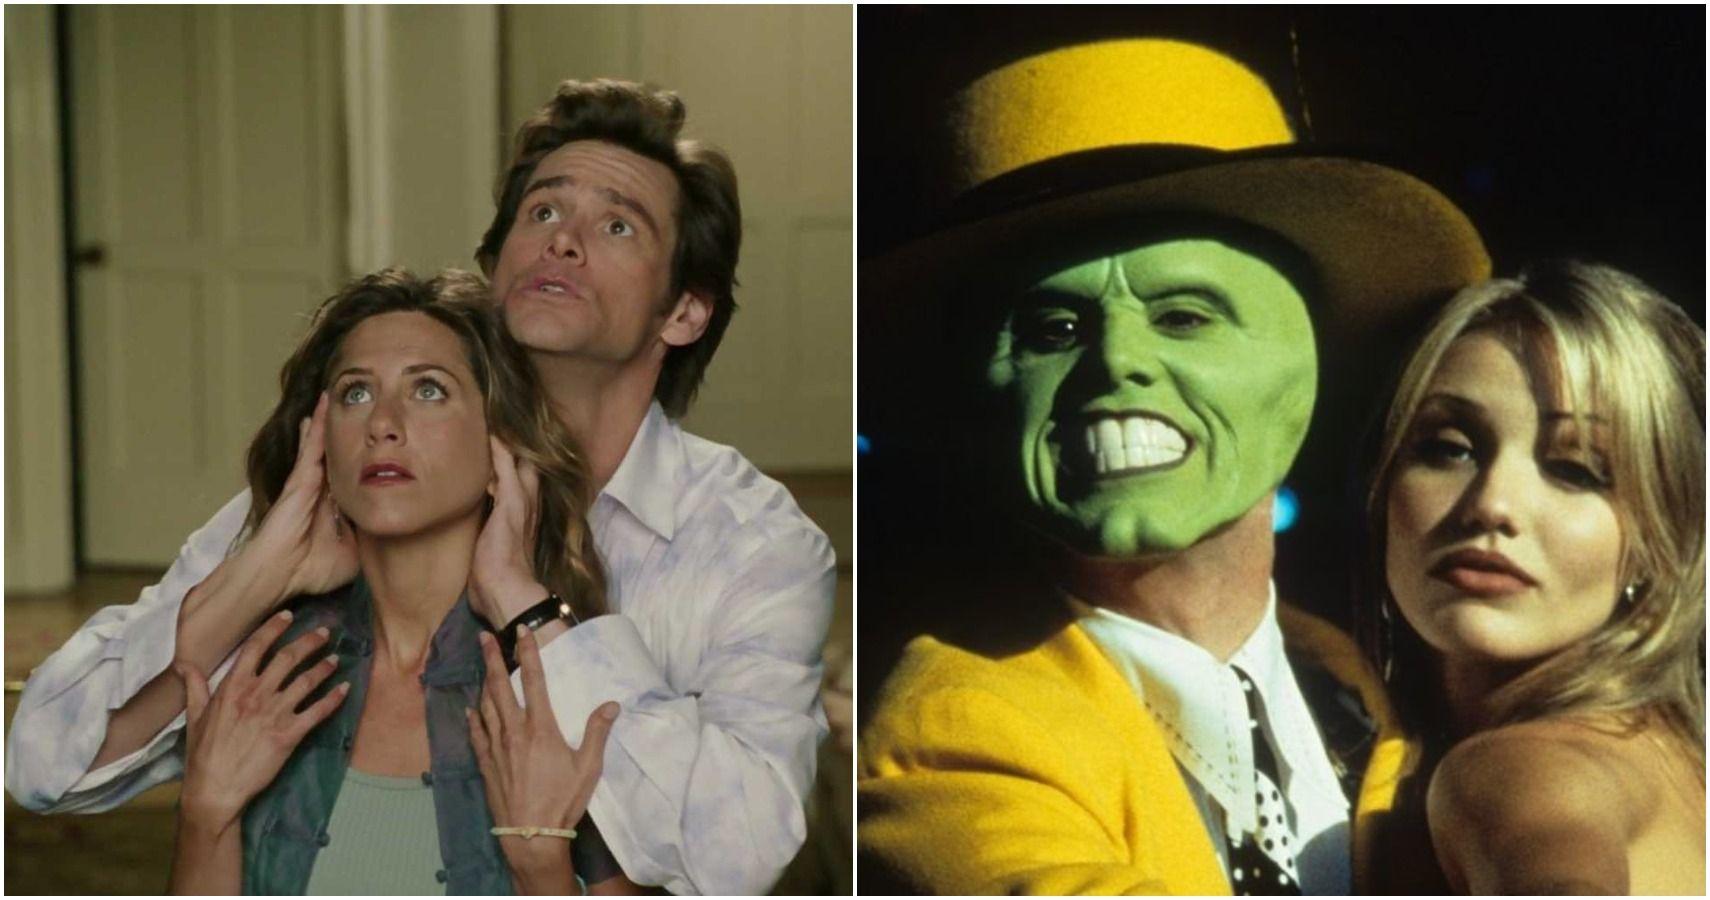 10 Best Jim Carrey Comedies, Ranked (According To IMDb)